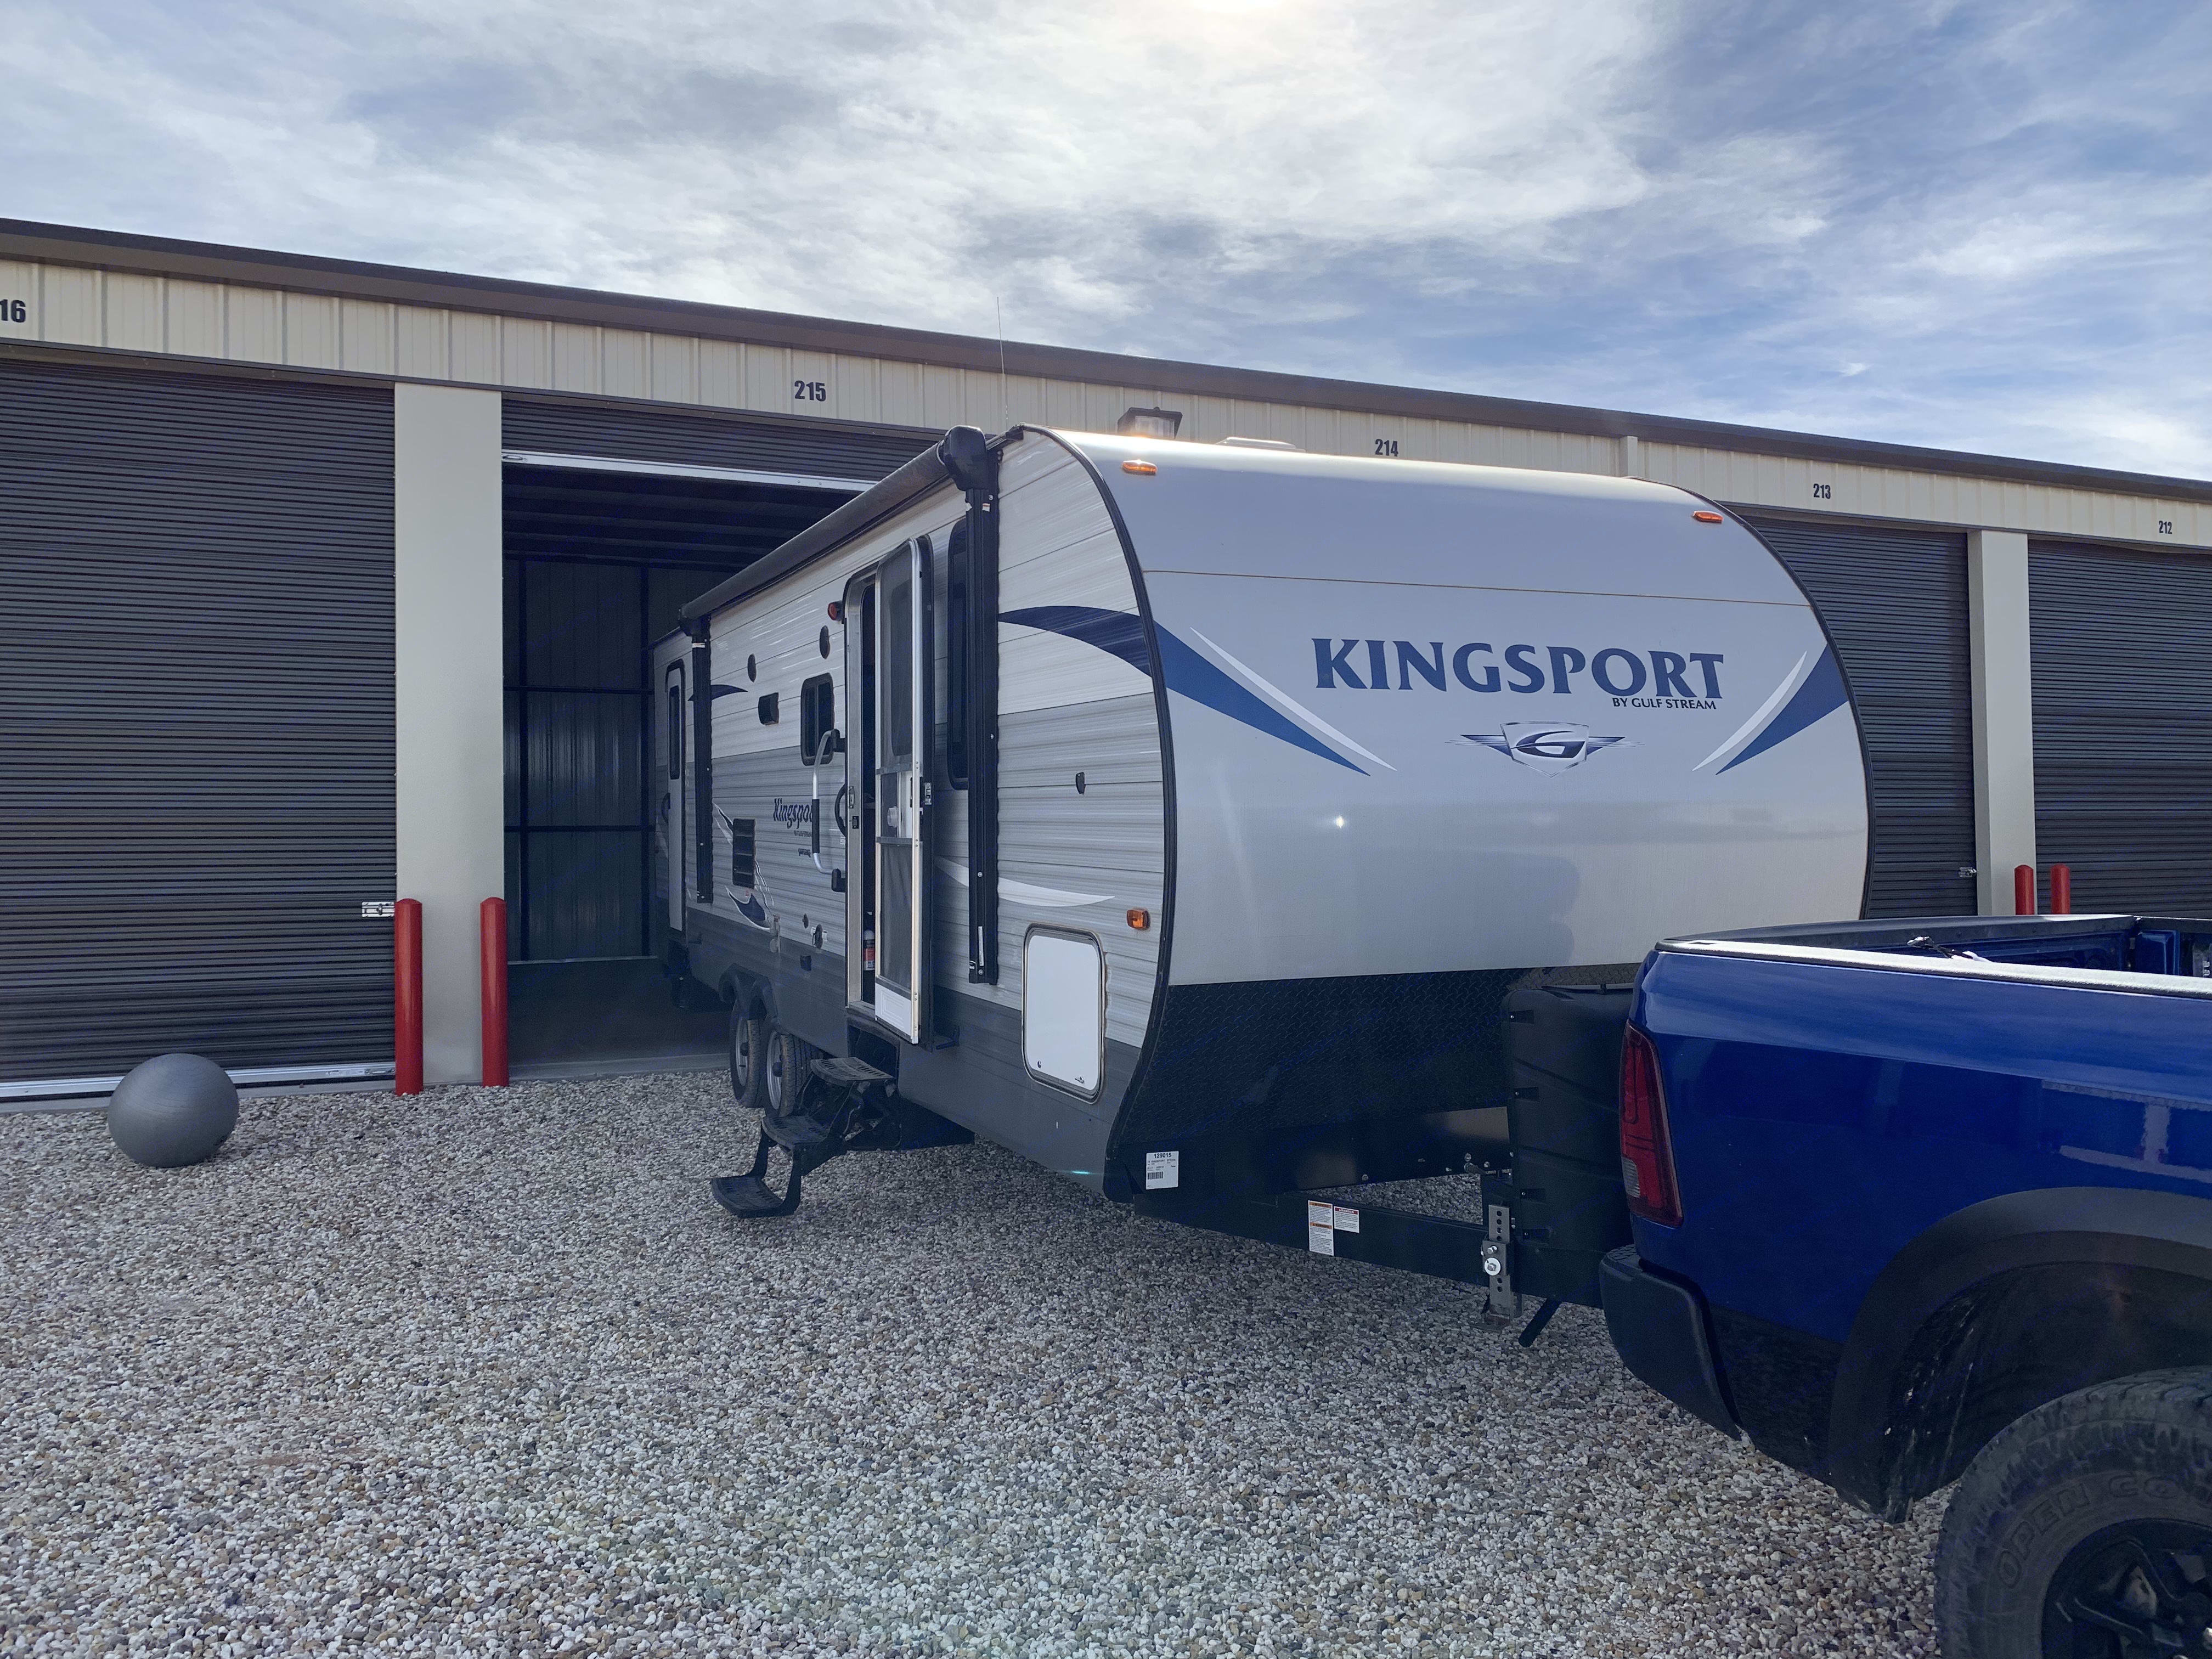 Gulf Stream Kingsport 2018